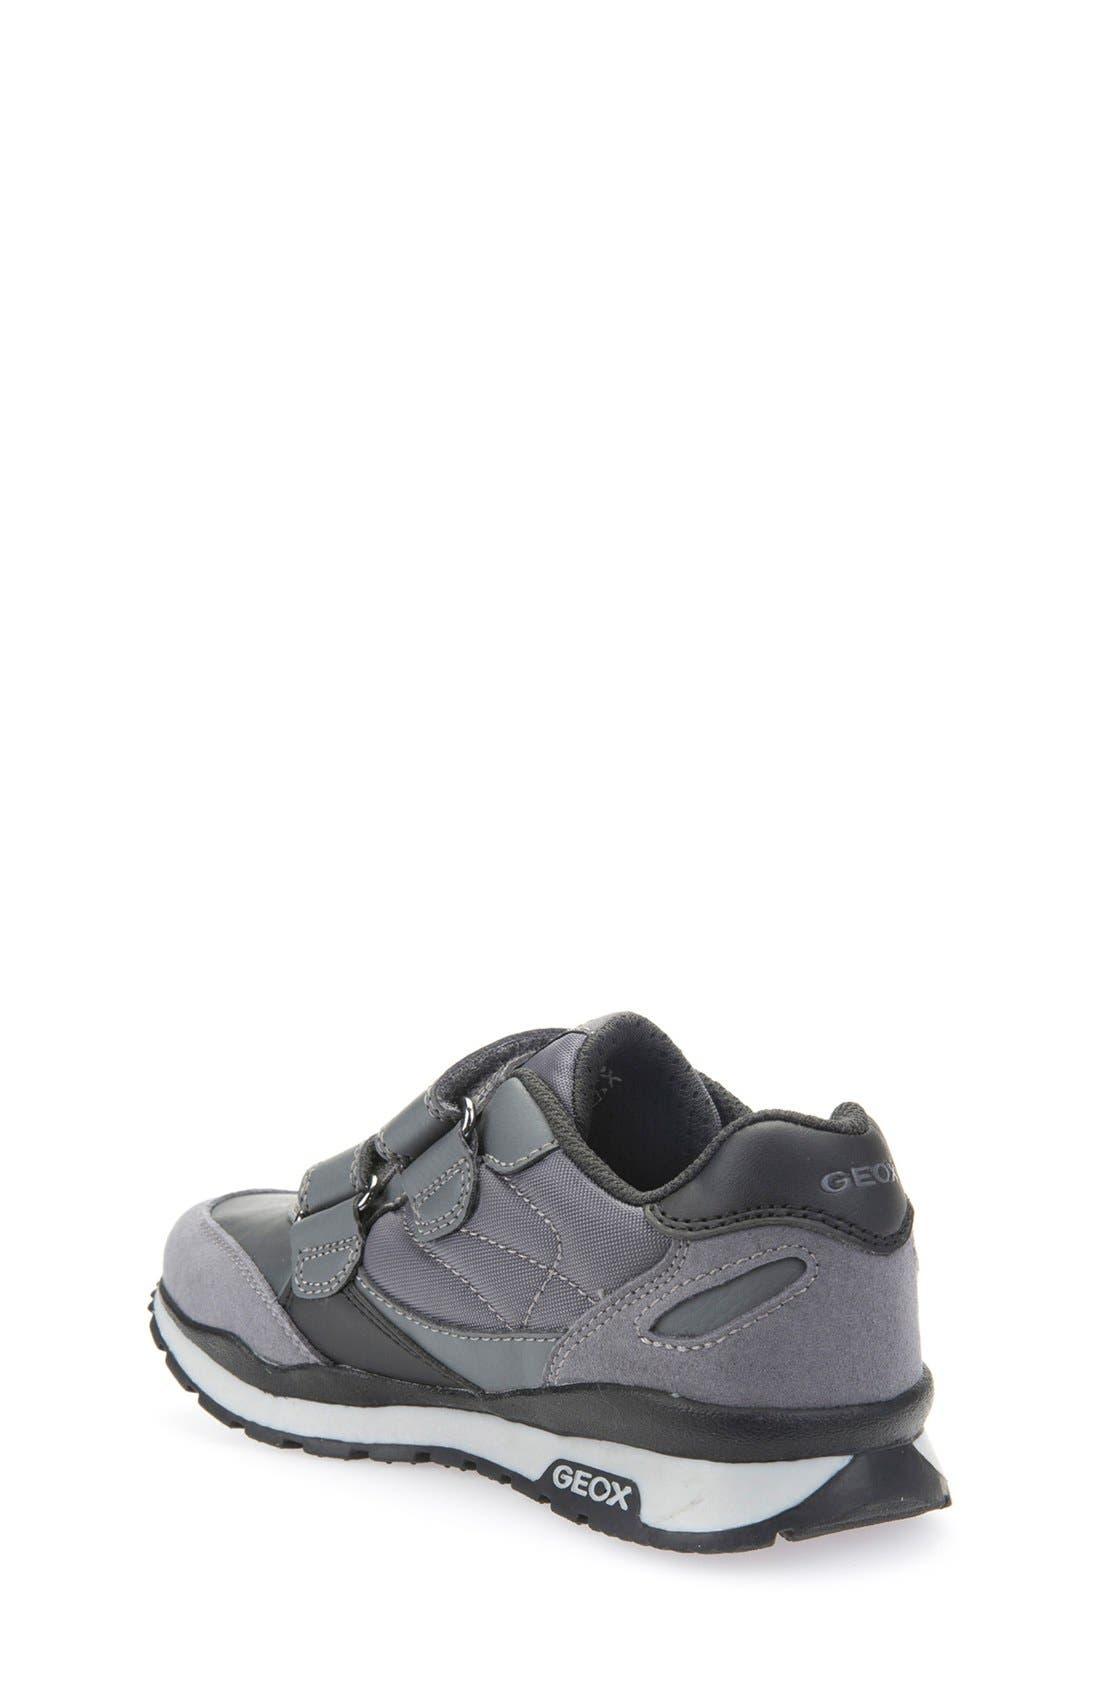 Alternate Image 2  - Geox Pavel Sneaker (Toddler, Little Kid & Big Kid)